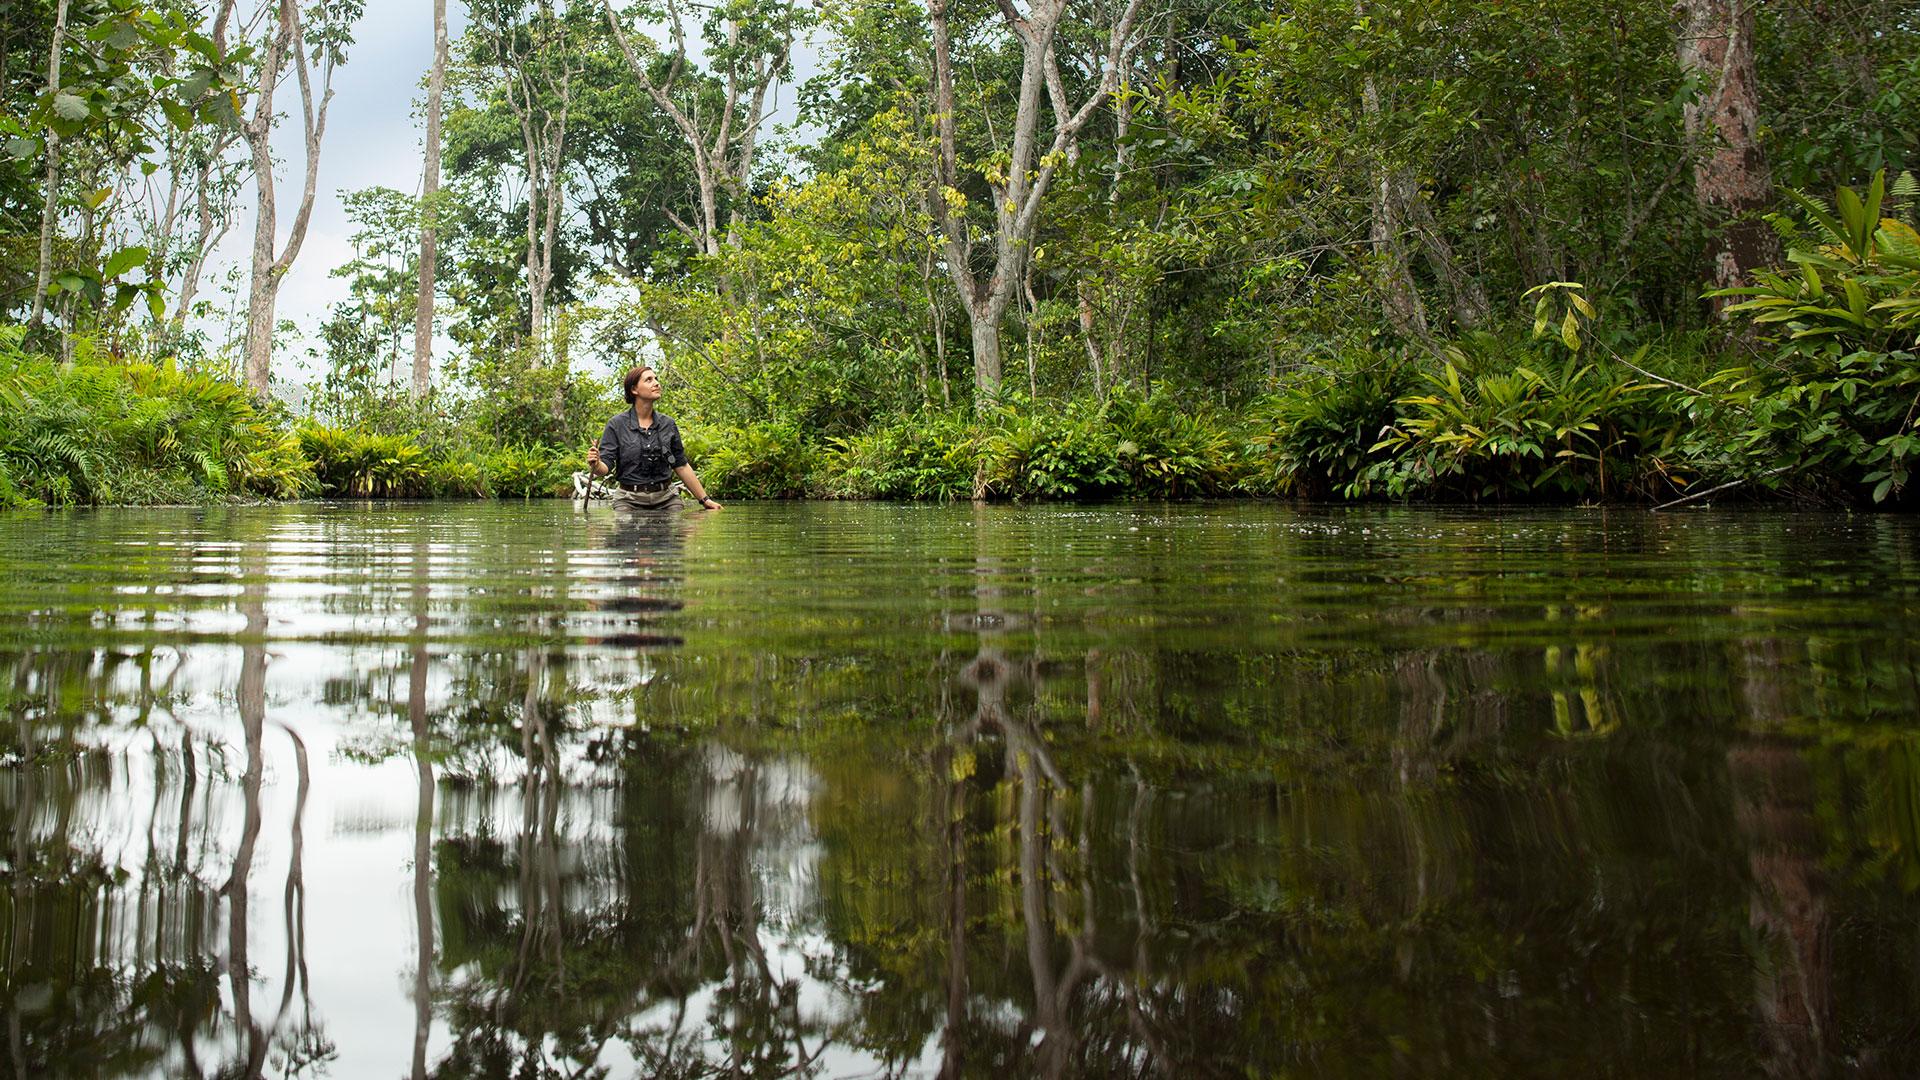 Woman wading through waist-high water near Lango Camp, Congo